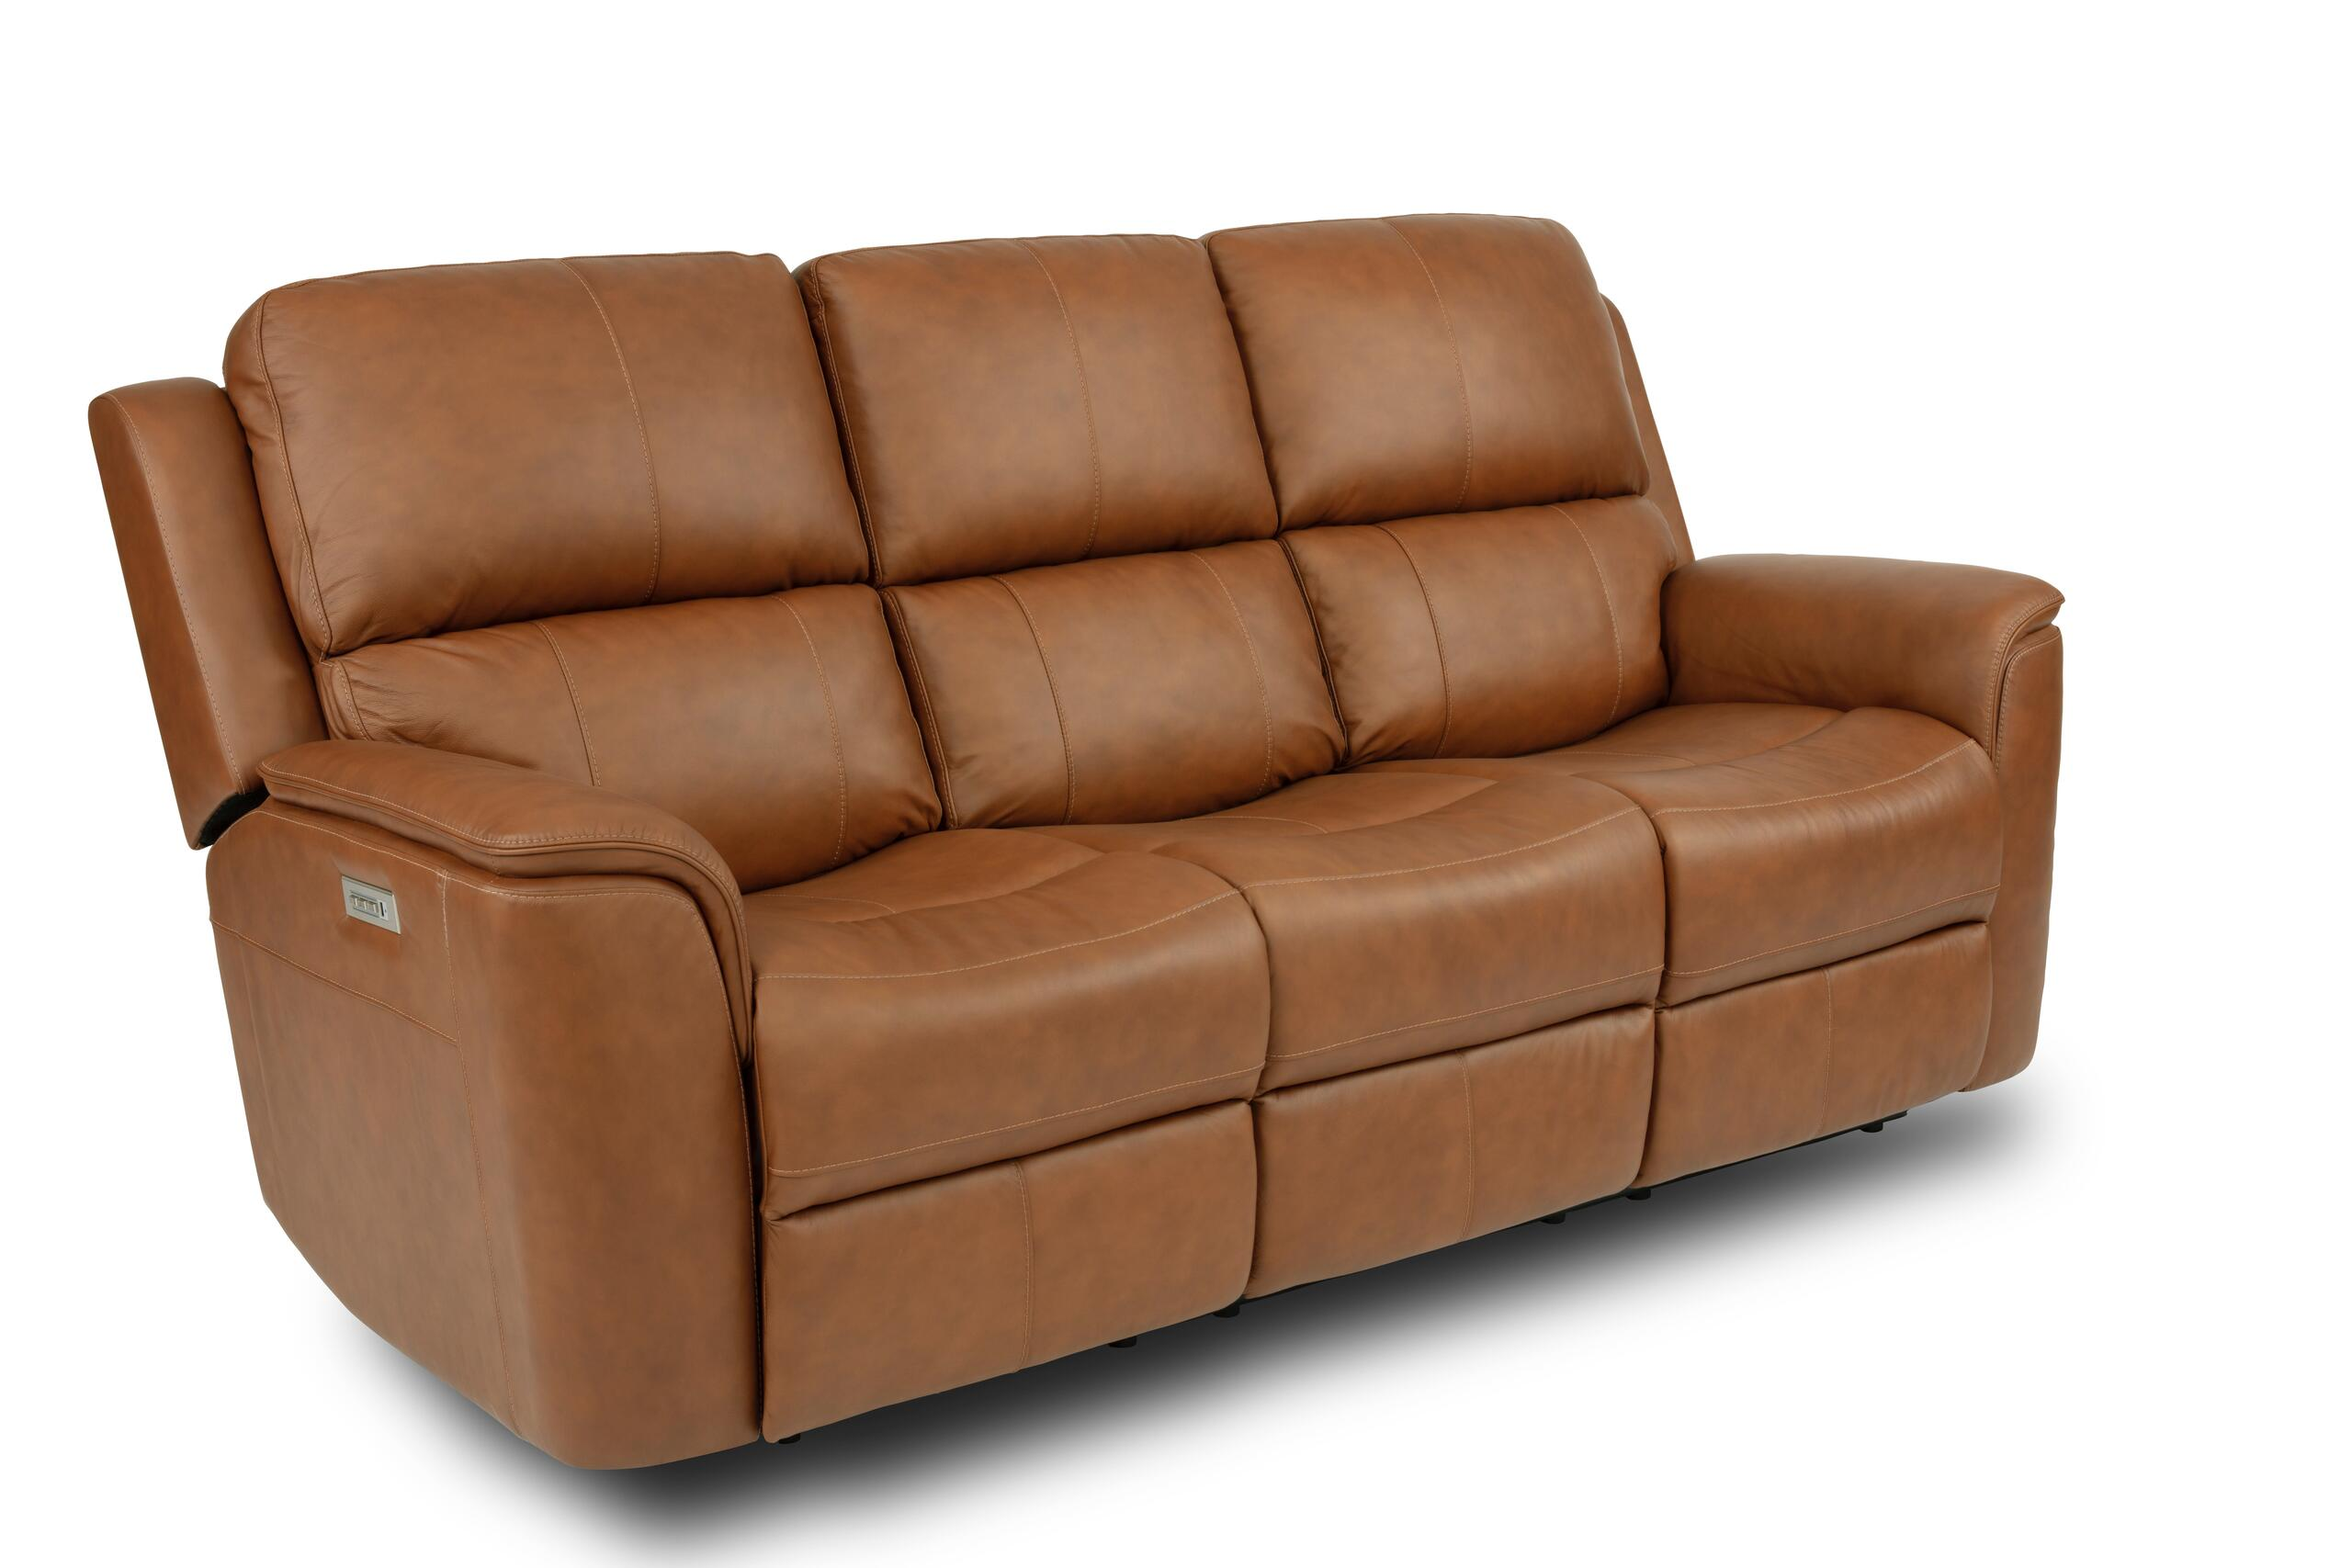 FlexsteelHenry Power Reclining Sofa With Power Headrests And Lumbar